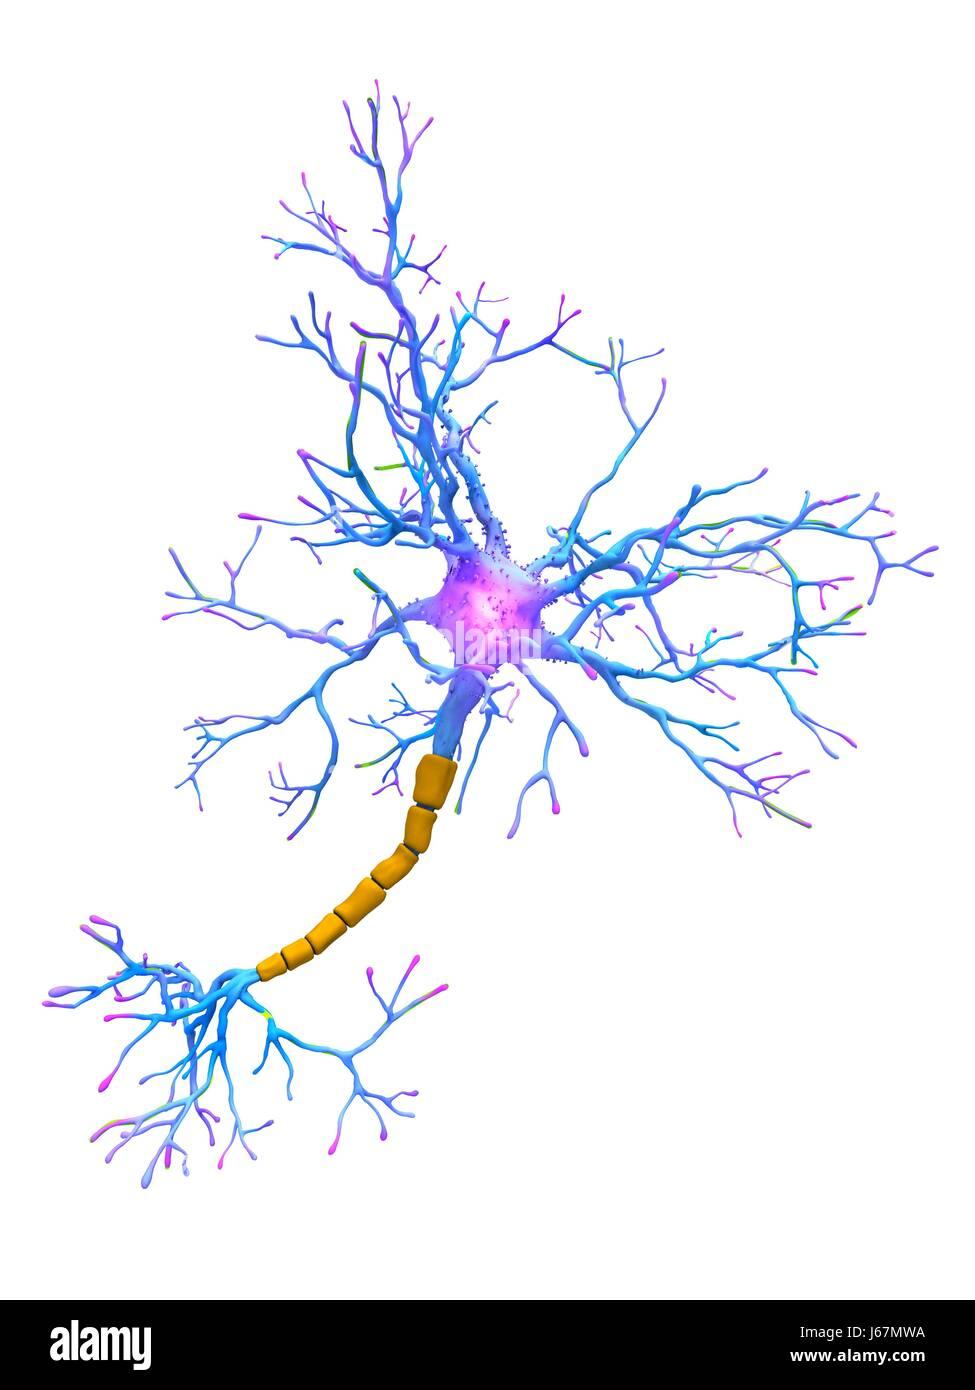 Nerve Sheath Stockfotos & Nerve Sheath Bilder - Seite 2 - Alamy